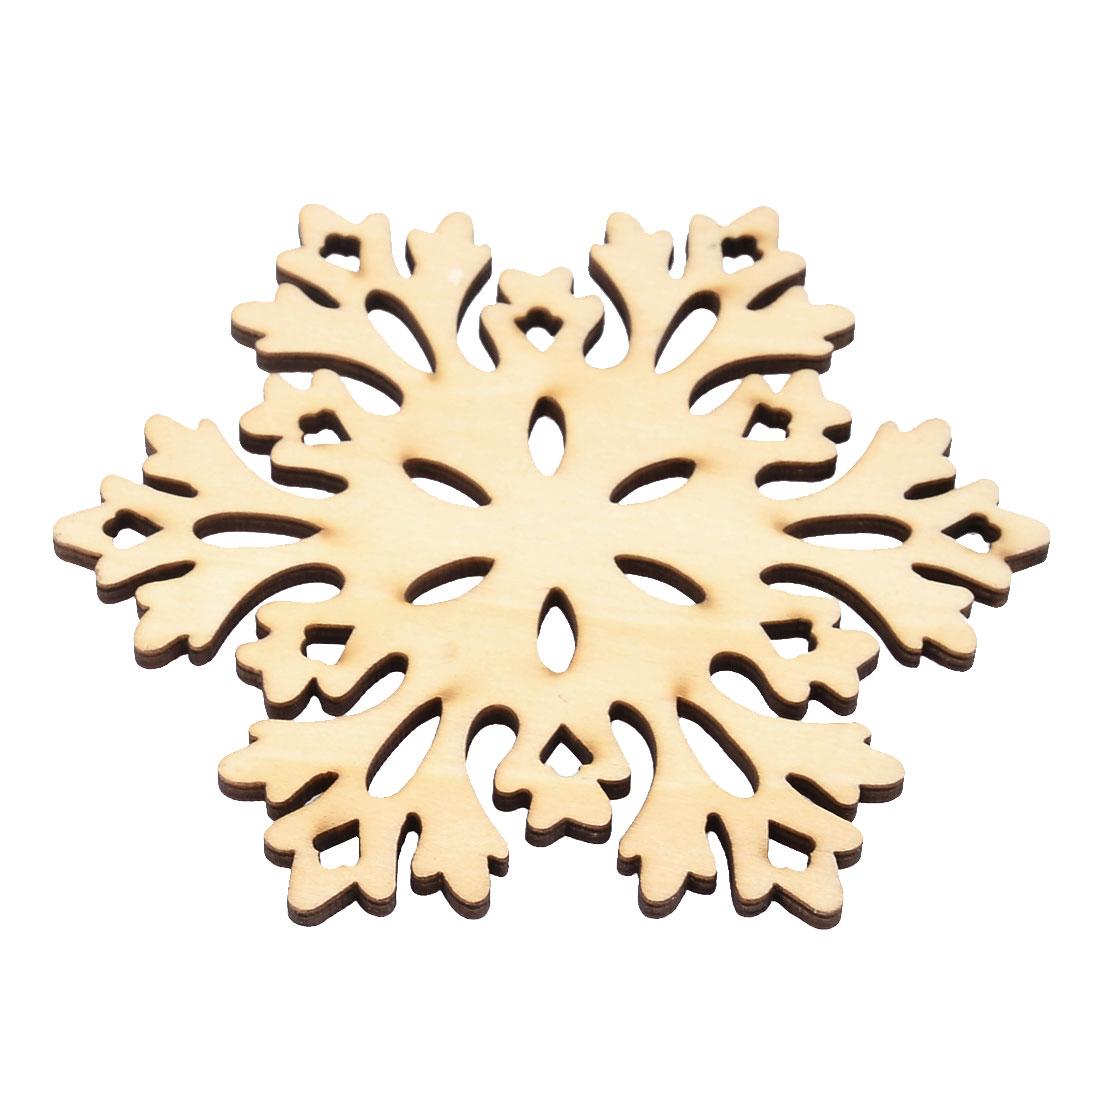 Wooden Snow Shape Tea Wine Cup Mat Holder Coffee Drinks Coaster